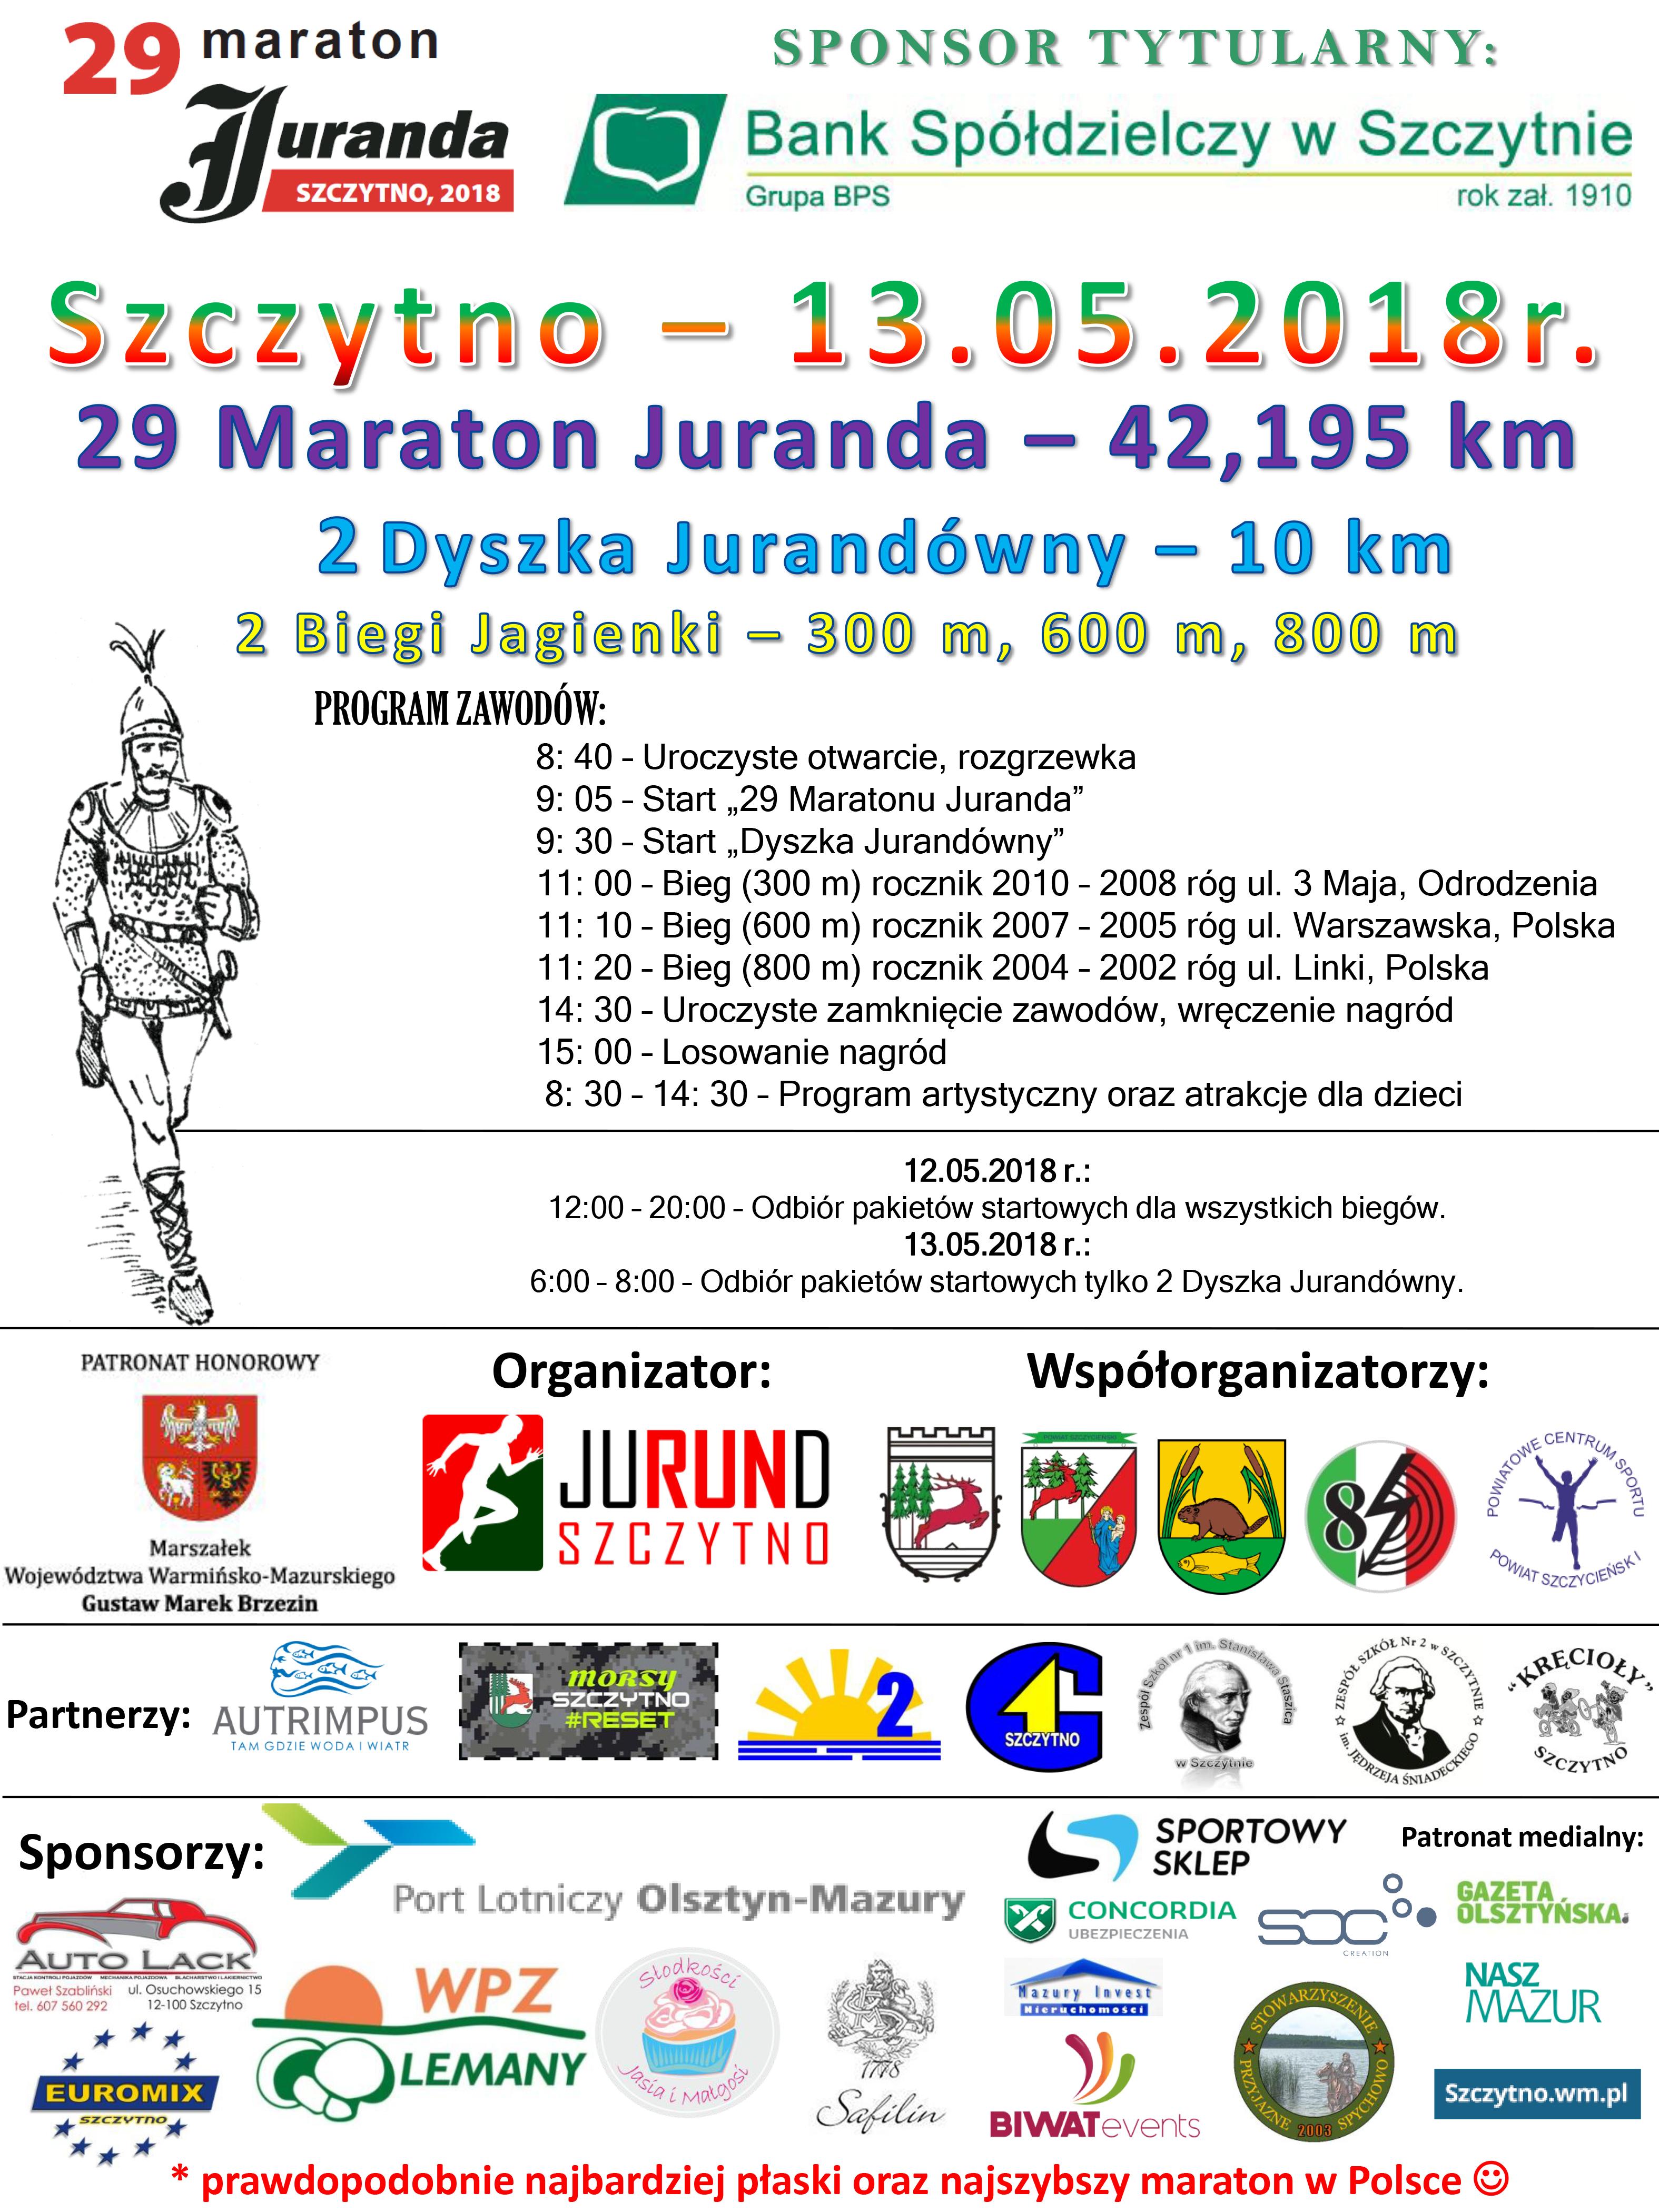 http://m.wm.pl/2018/05/orig/maraton-plakat-loga-463326.jpg